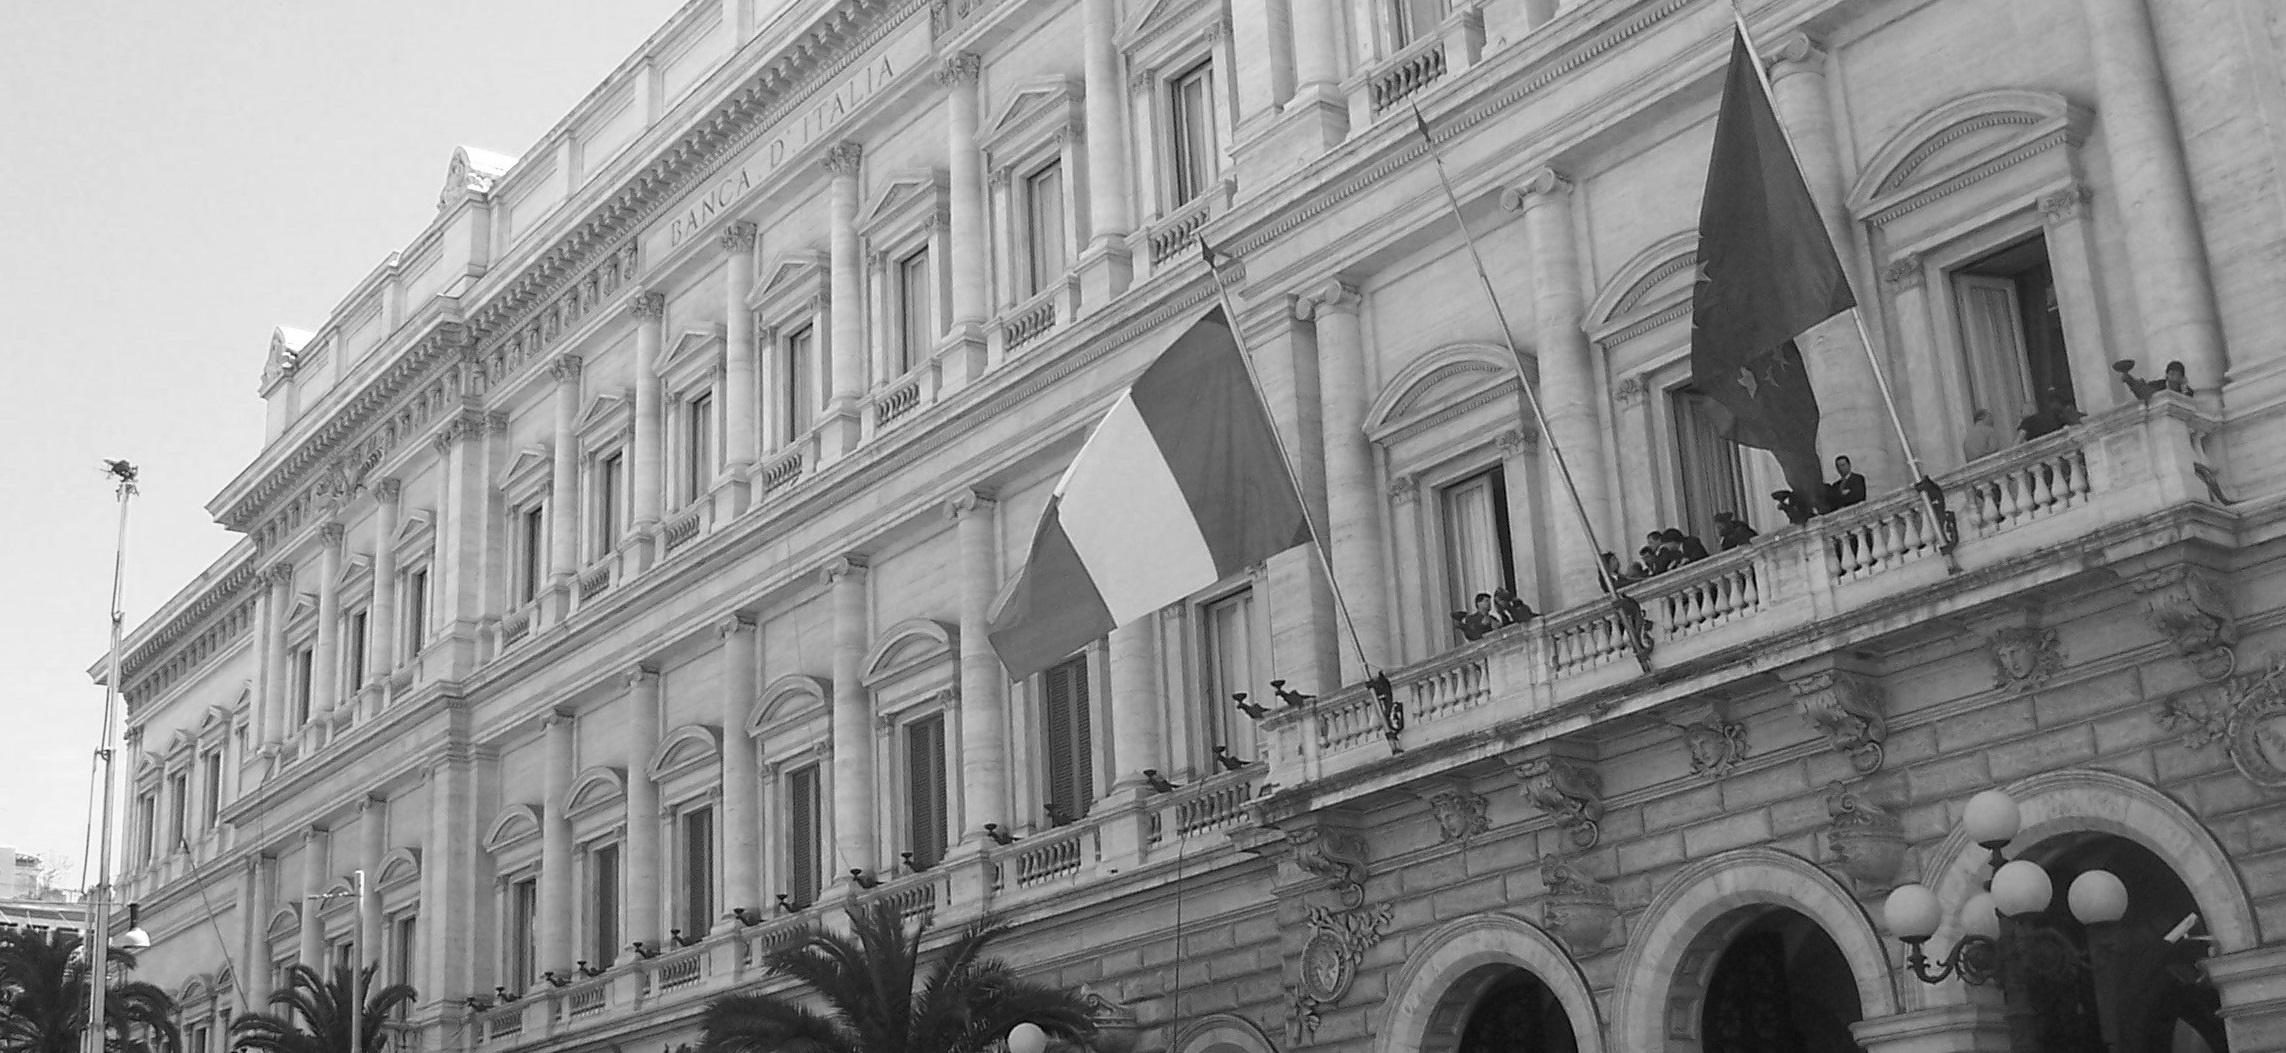 Newsalert - Unità di Informazione Finanziaria per l'Italia (UIF) - Istruzioni in materia di comunicazioni oggettive